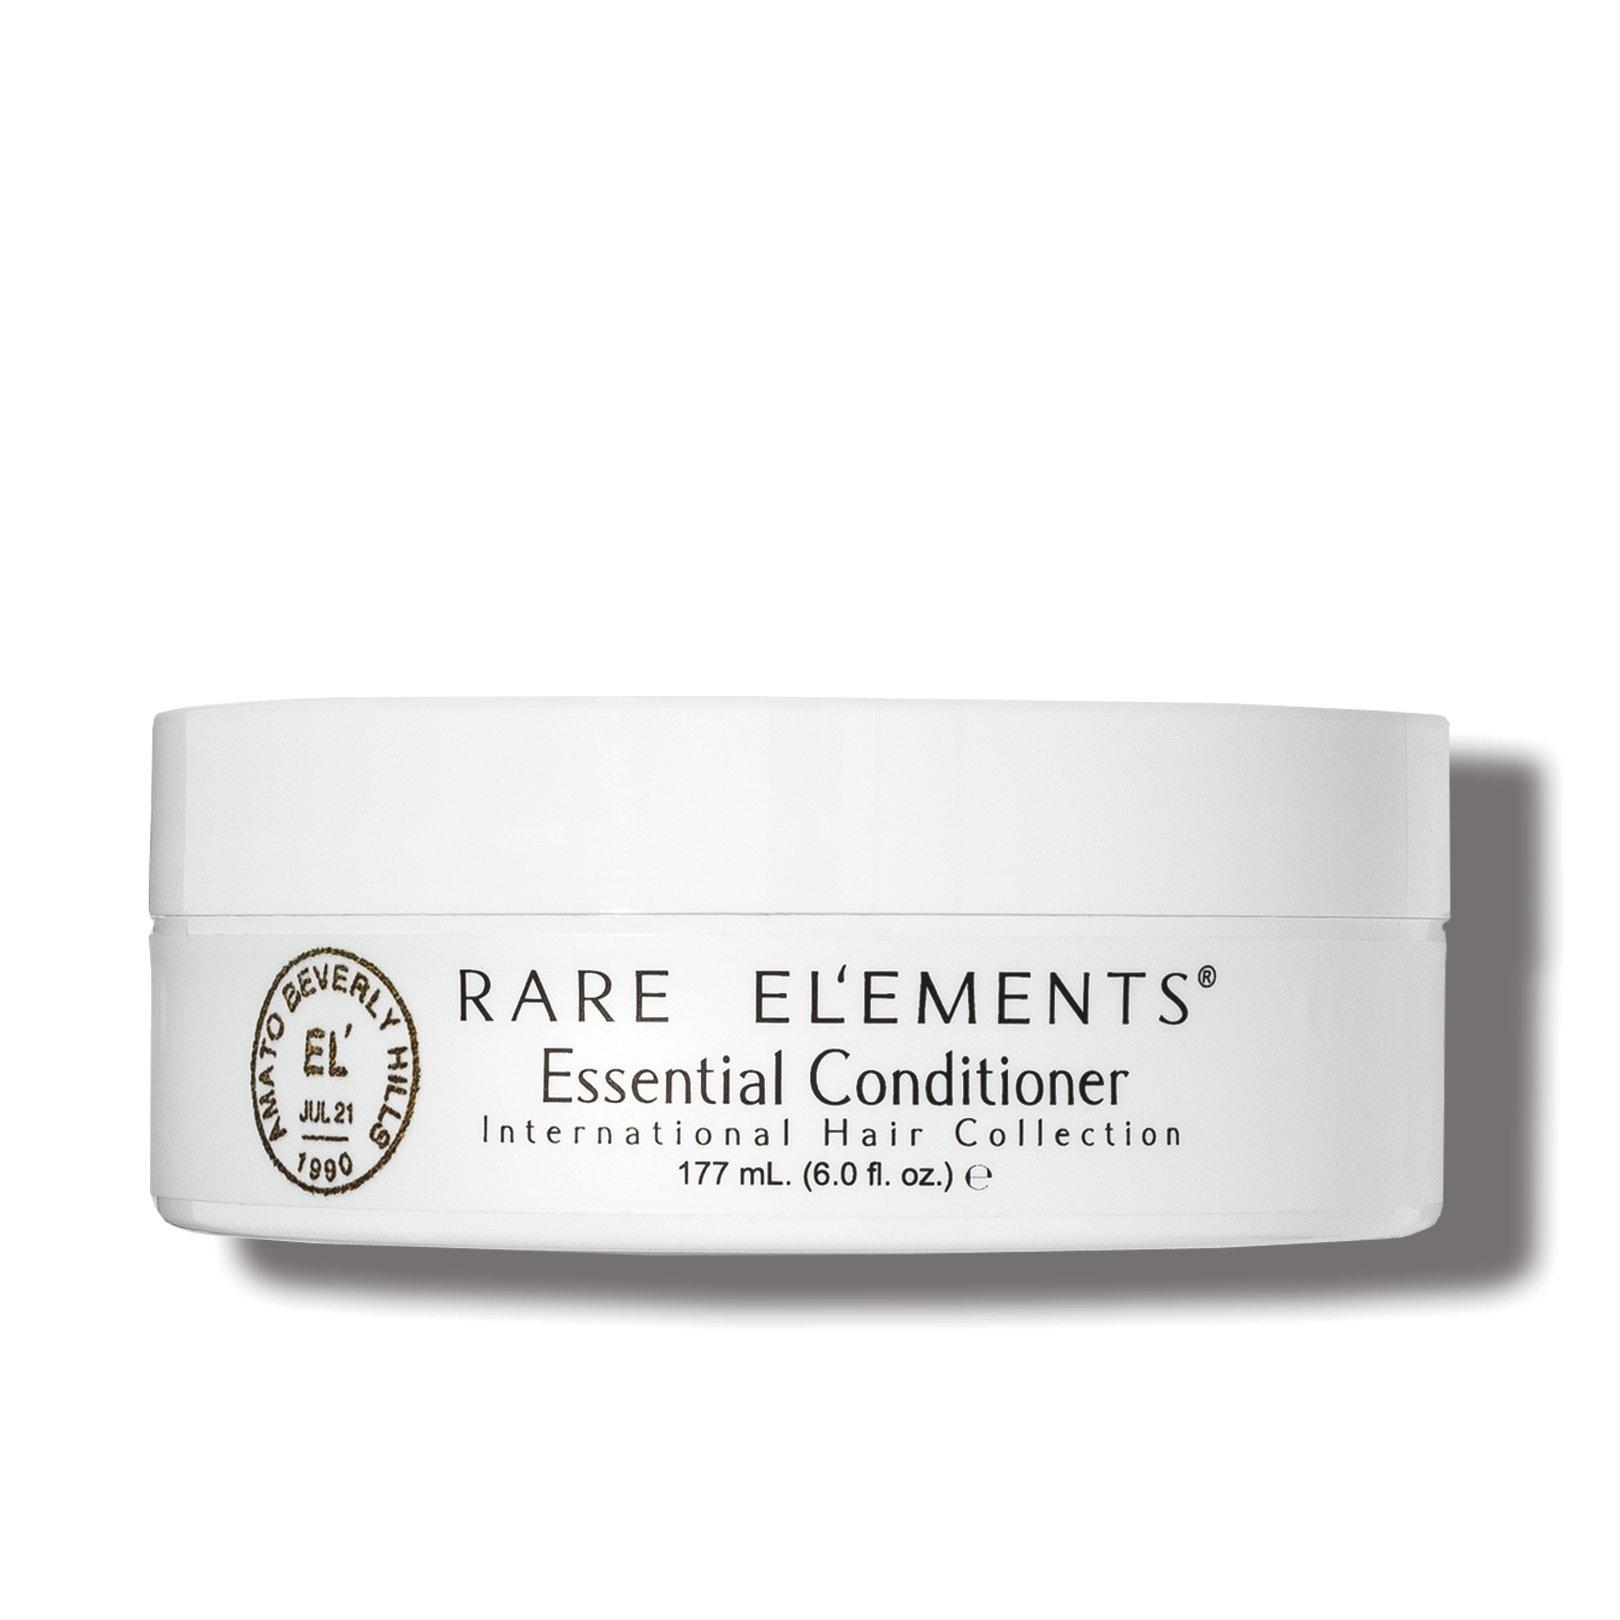 RARE EL'EMENTS Essential Conditioner - 195ml